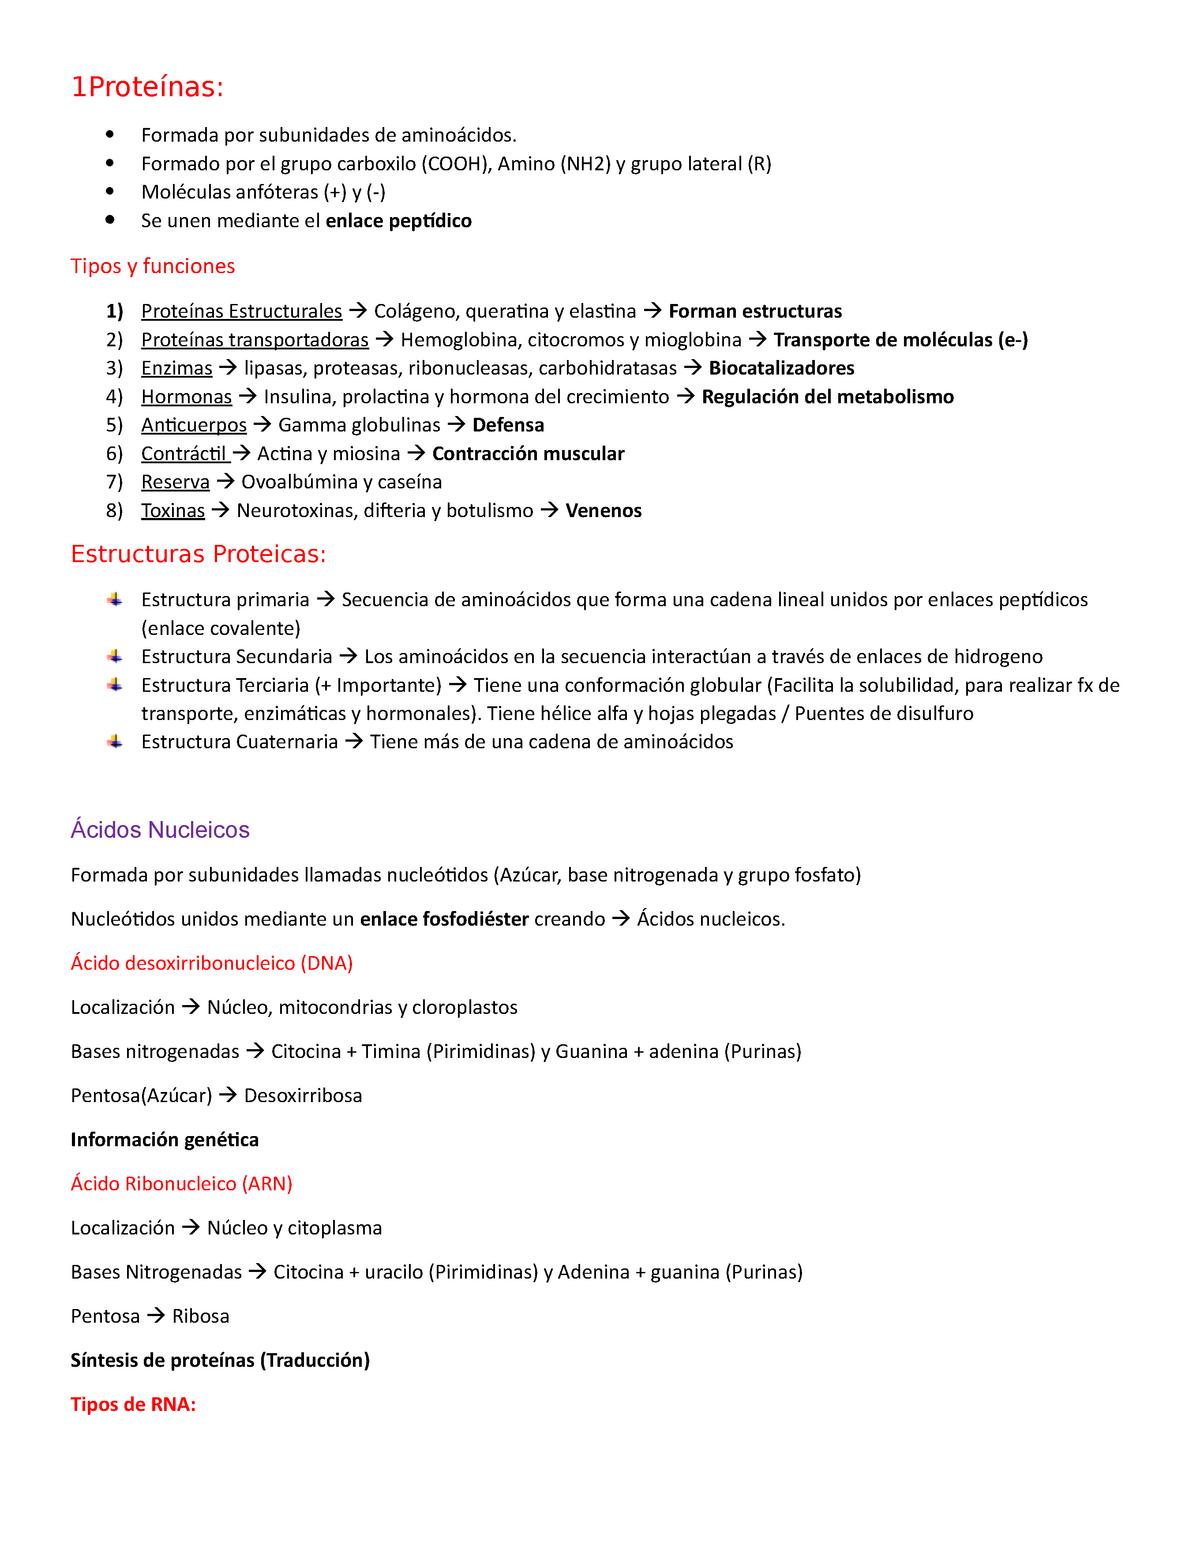 Resumen Ii Solemne Biologia Fisiologia Renal Y Digestiva